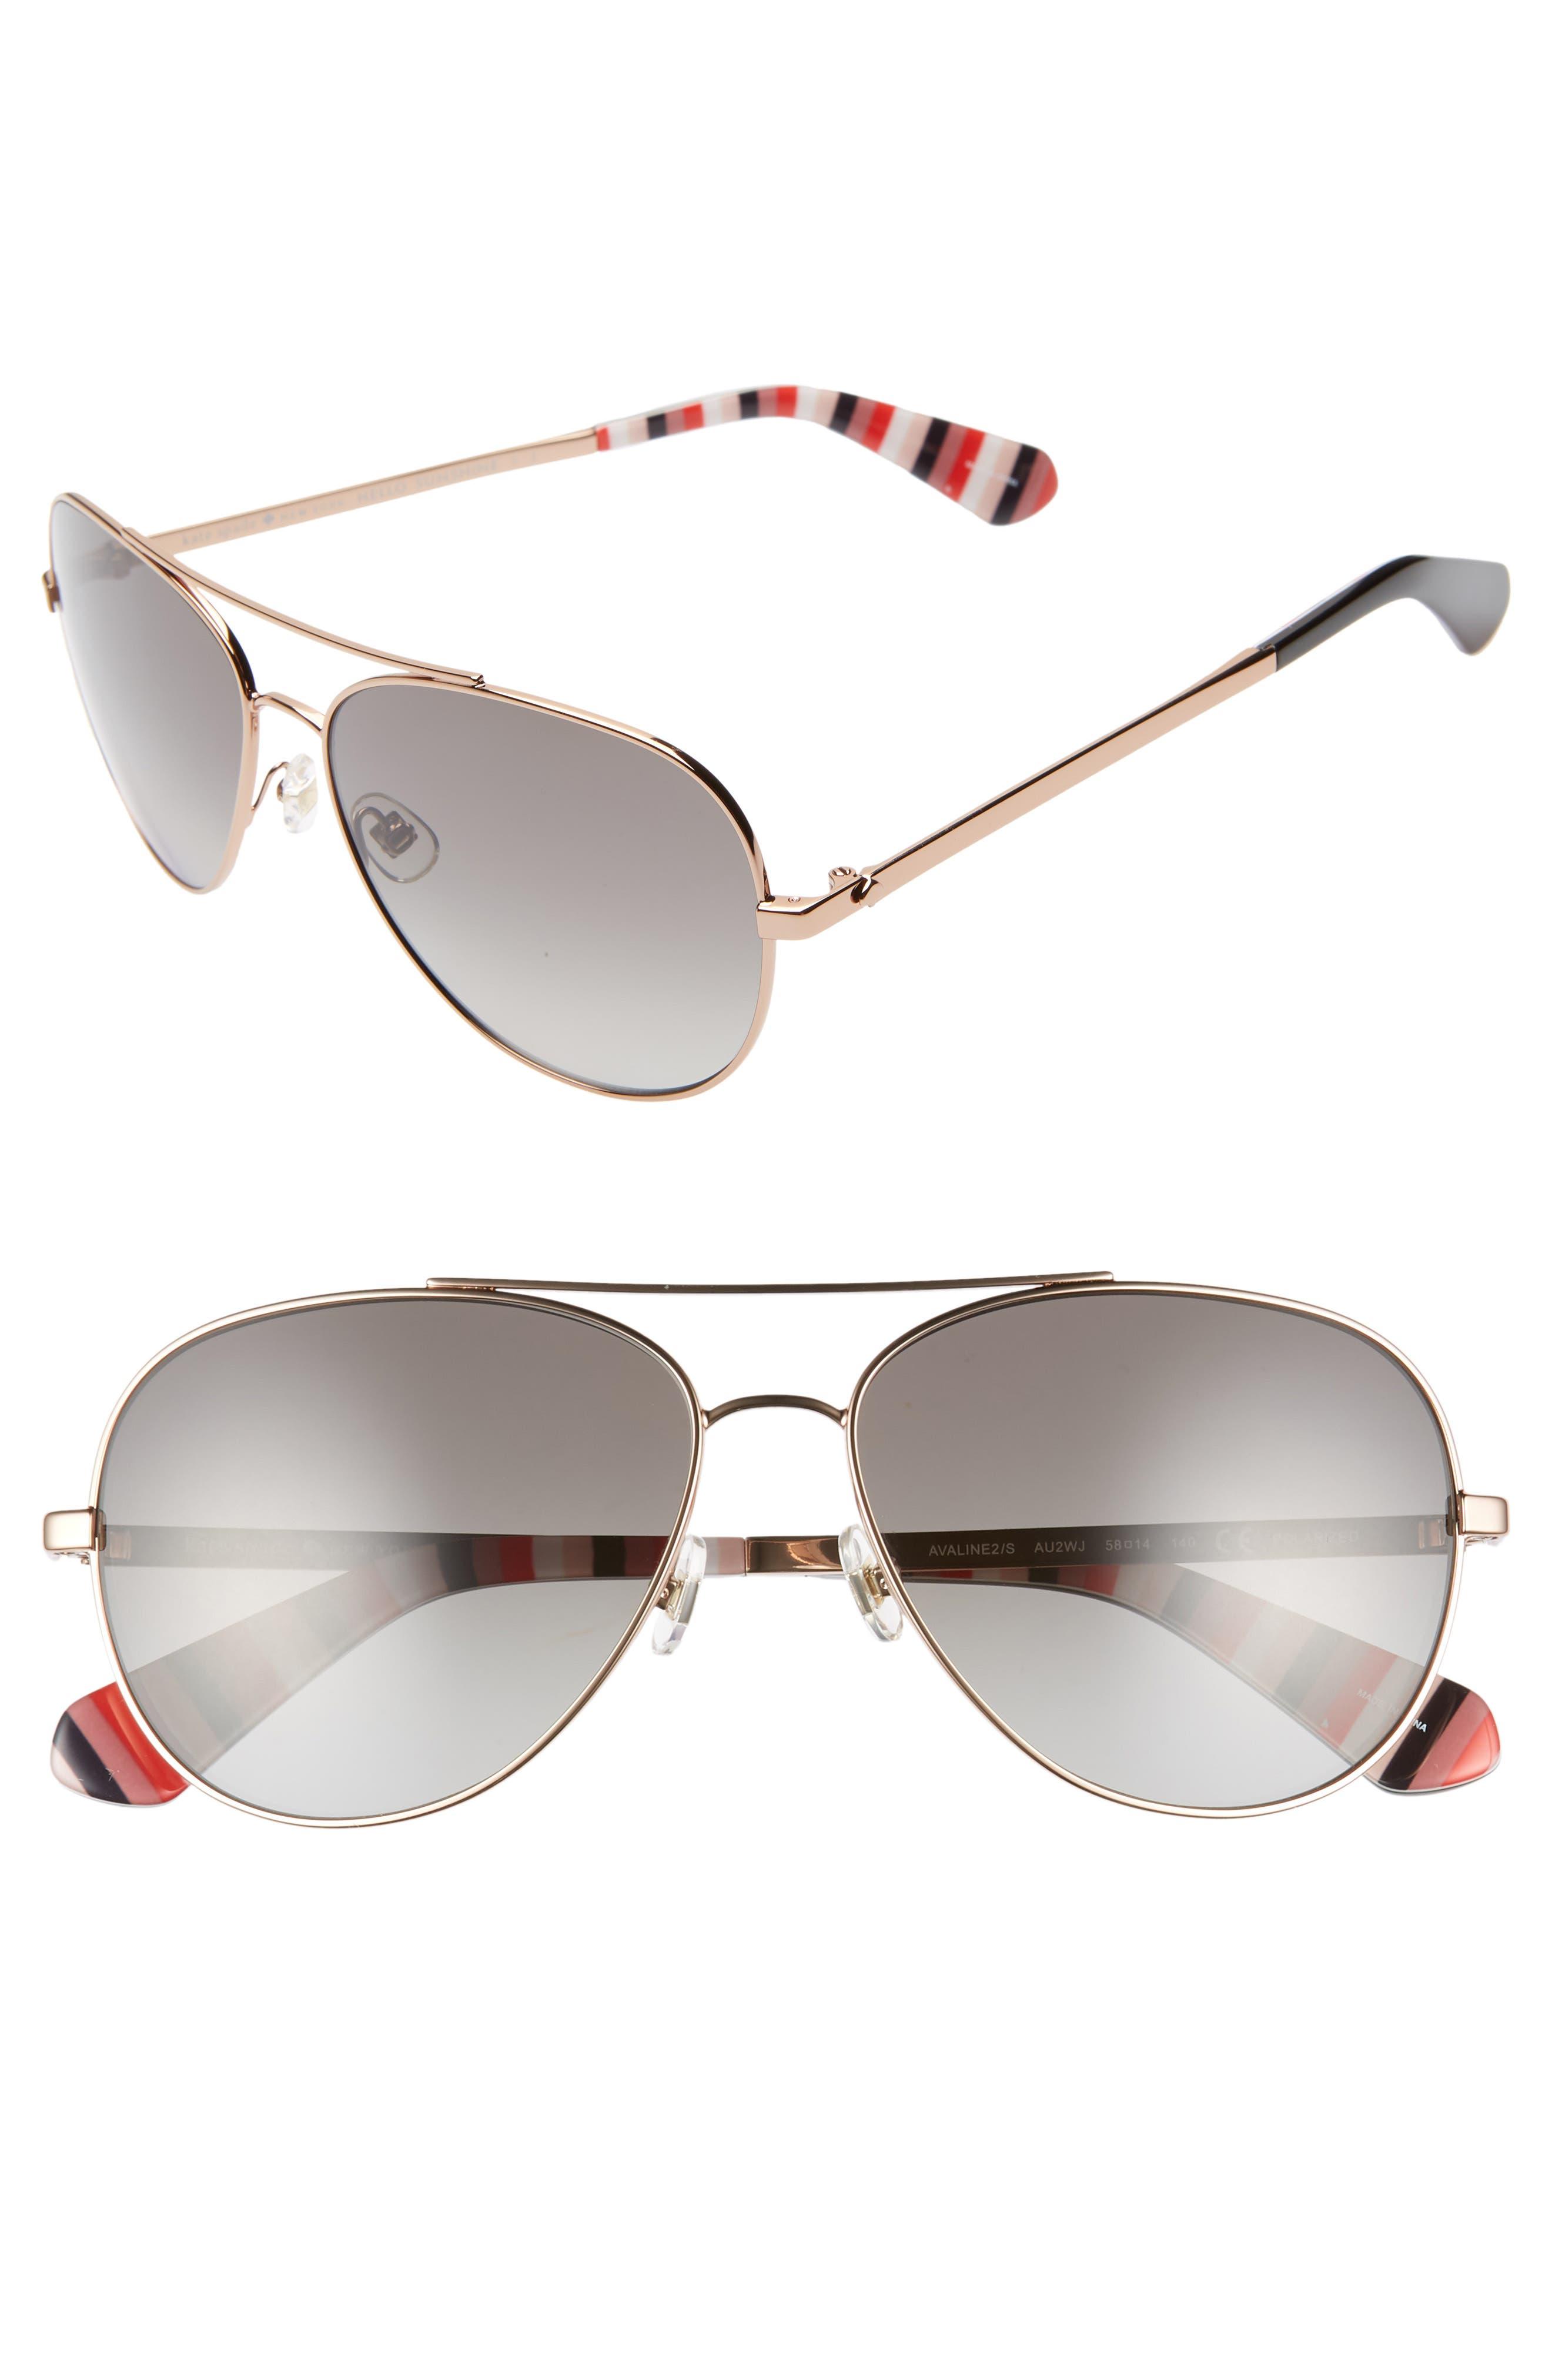 2c56344891337 Kate Spade New York Aviator Sunglasses